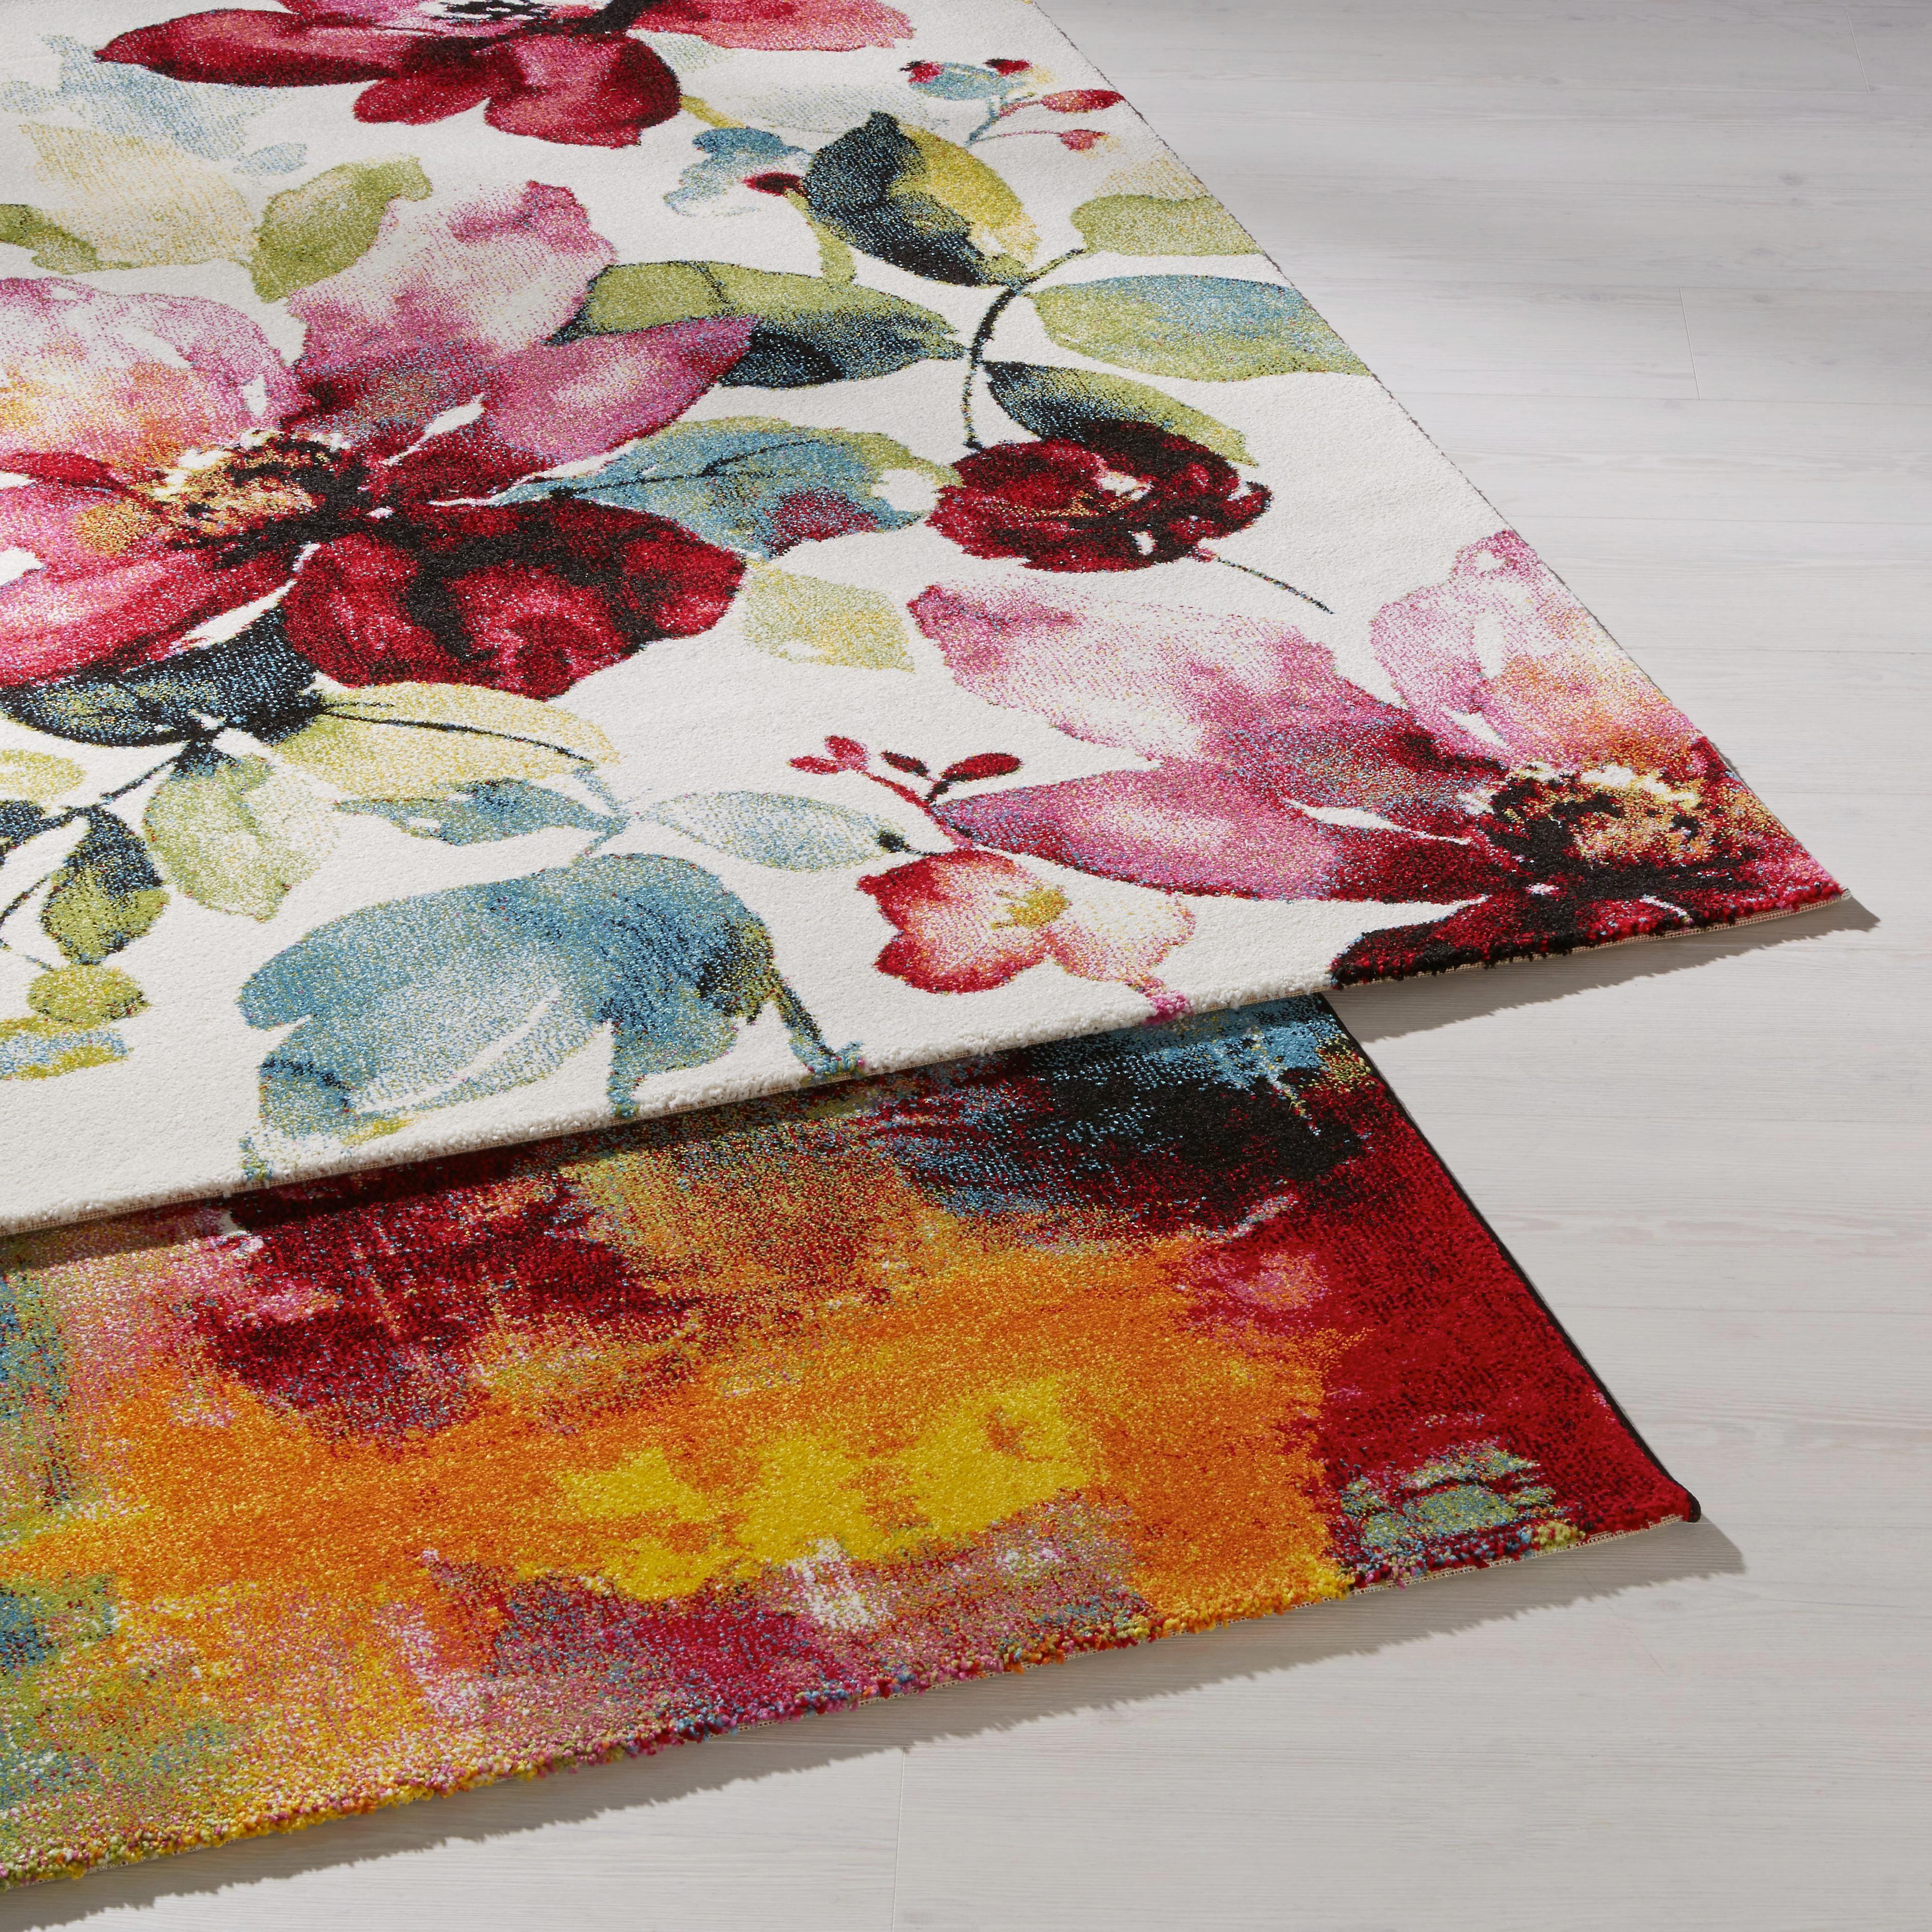 Szőnyeg Flower - multicolor, romantikus/Landhaus, textil (160/230cm) - MÖMAX modern living